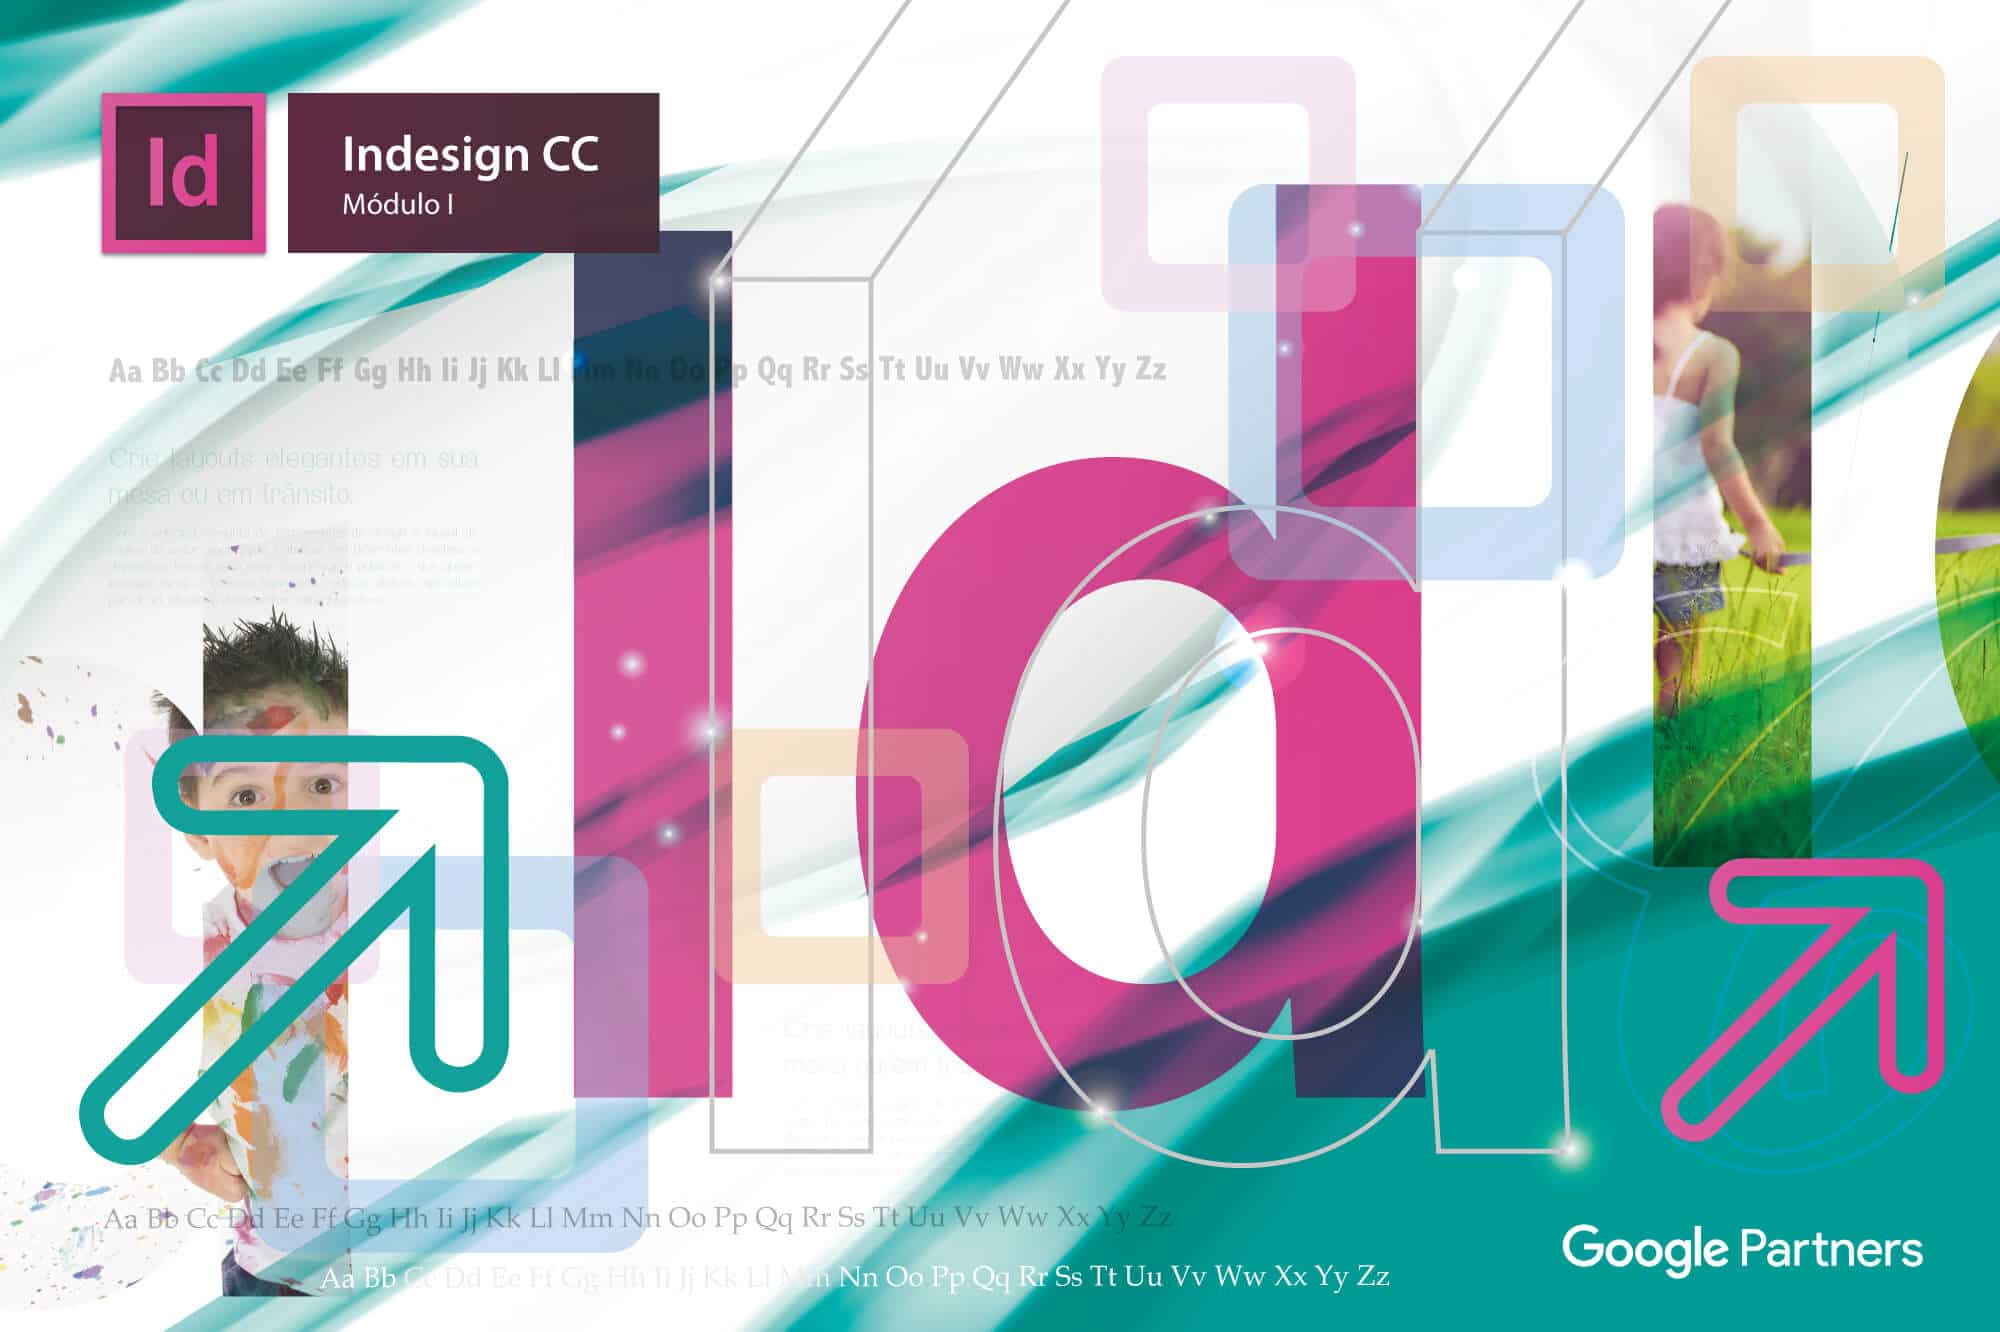 Indesign-2000x1332-mod_I